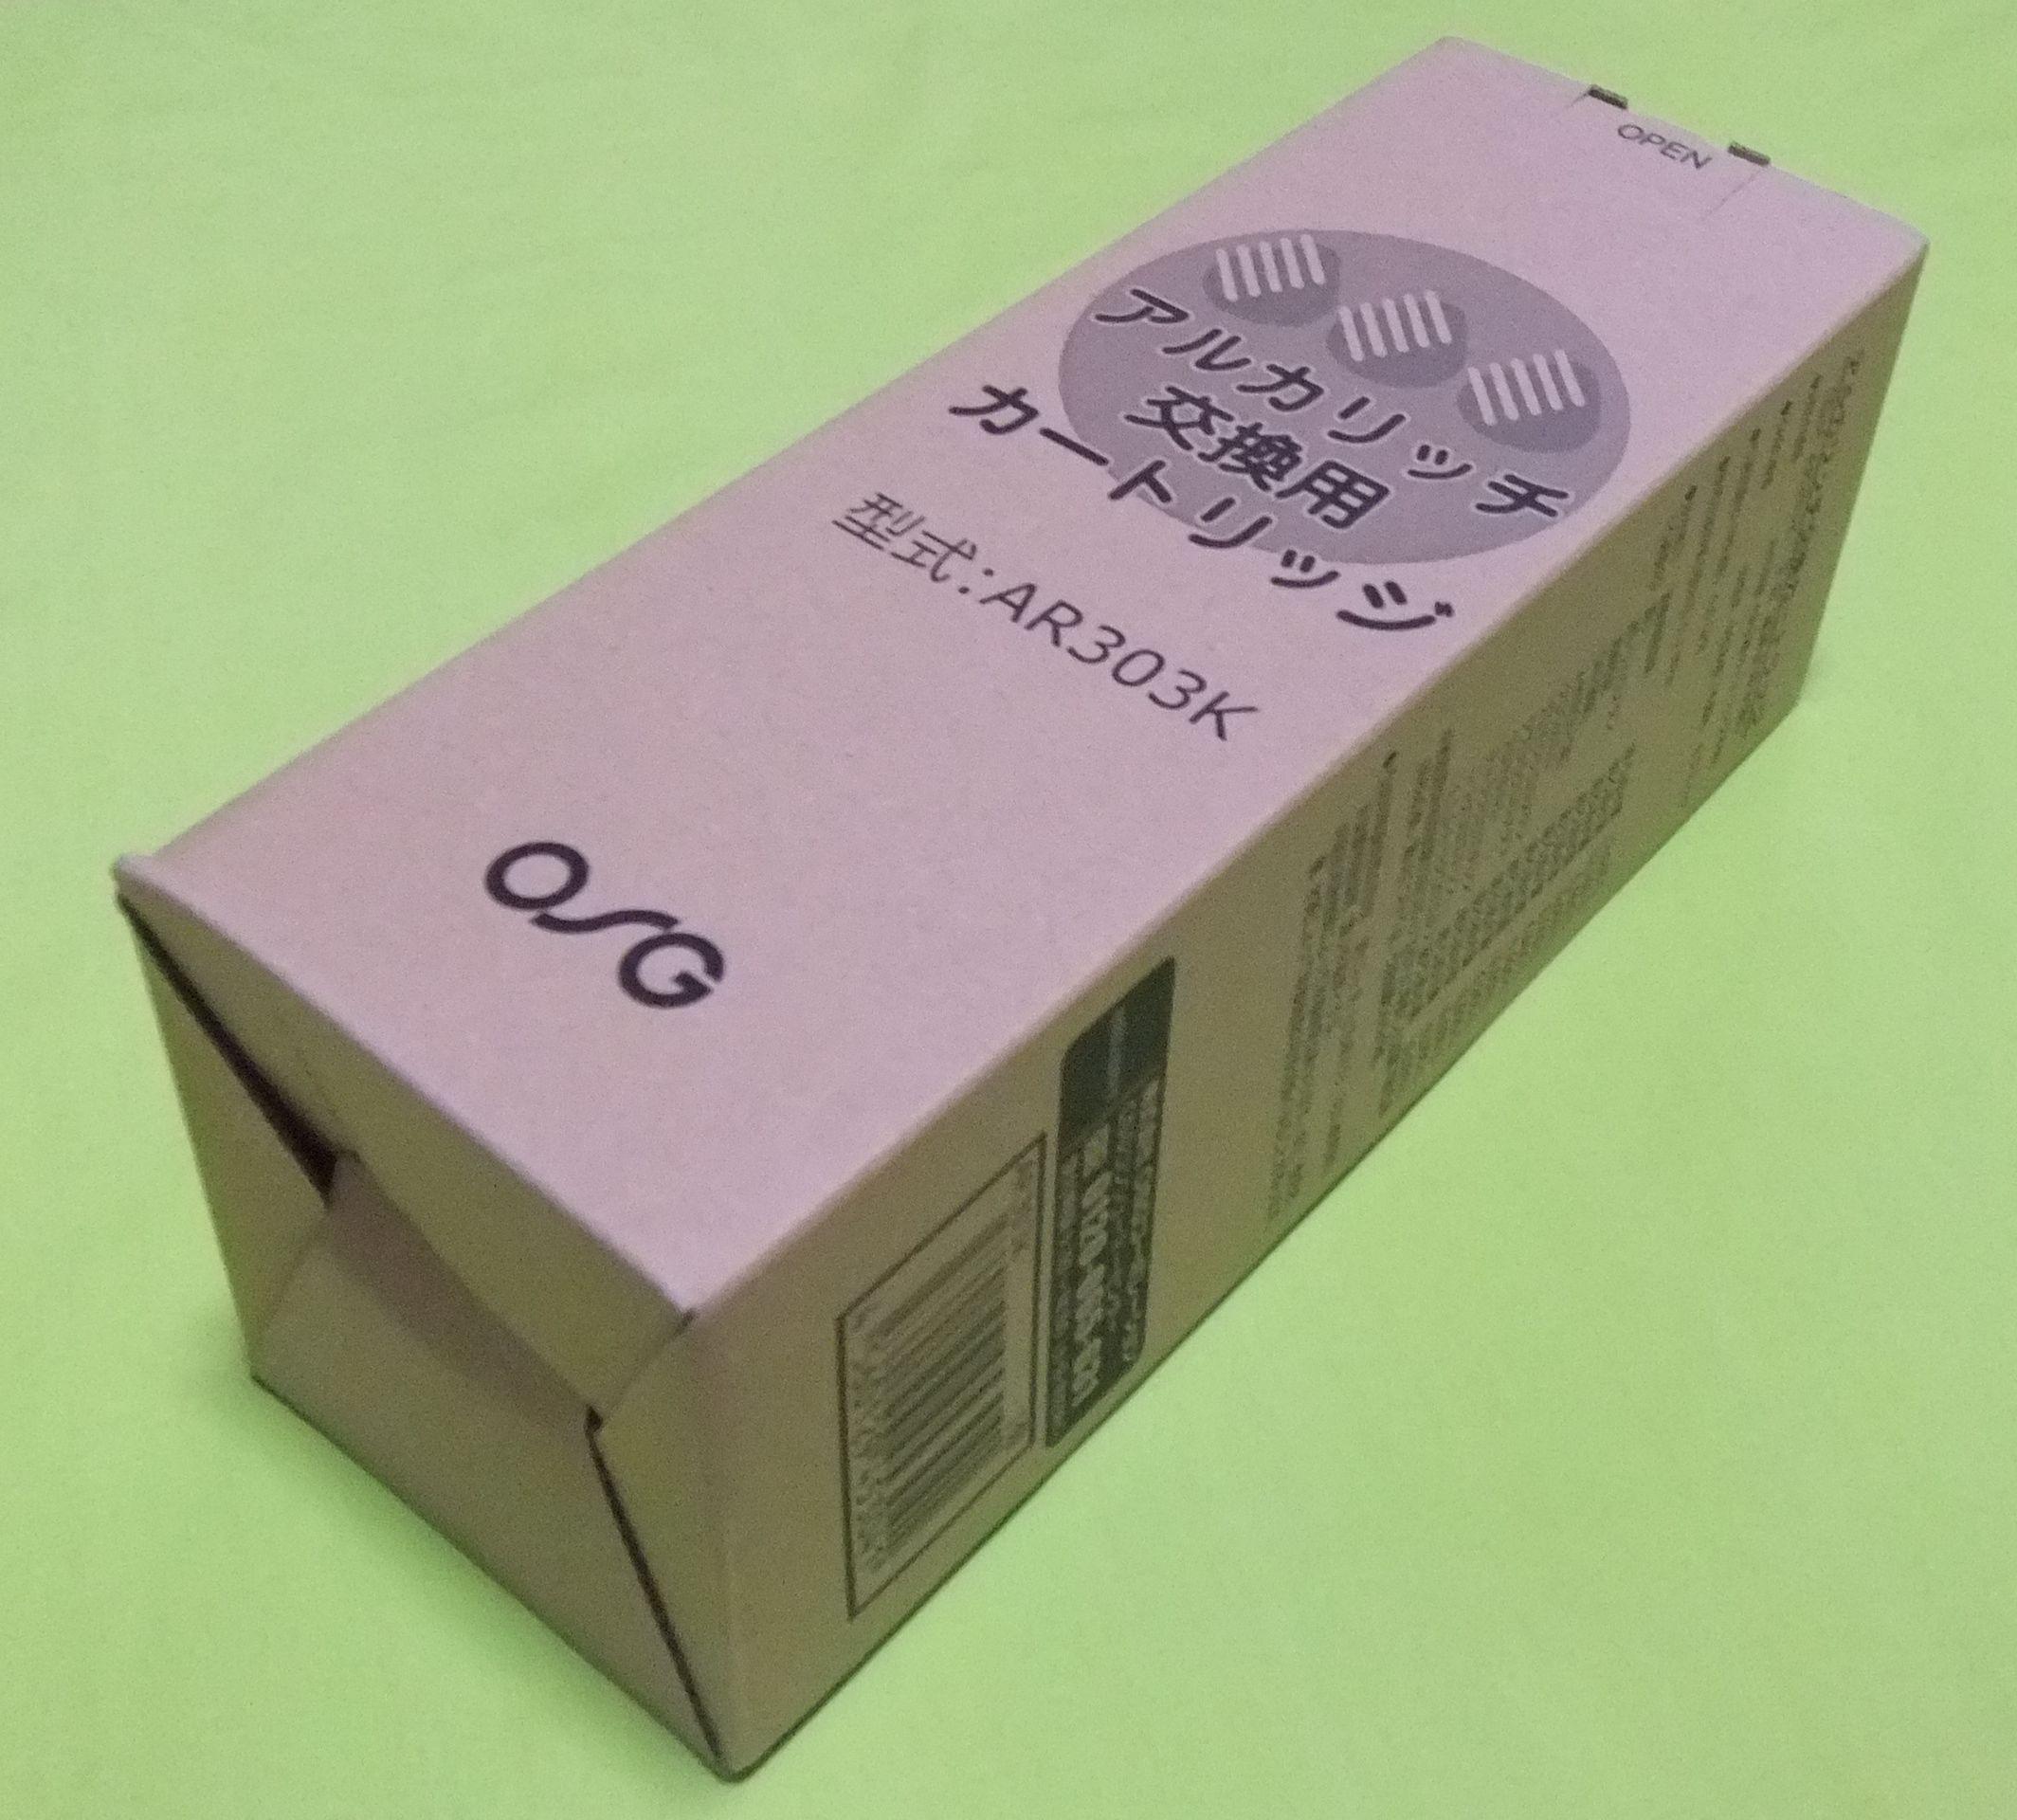 OSGコーポレーション 電解水素水生成器 浄水器 アルカリッチ NDX‐303LMW用交換カートリッジ AR303K 送料無料